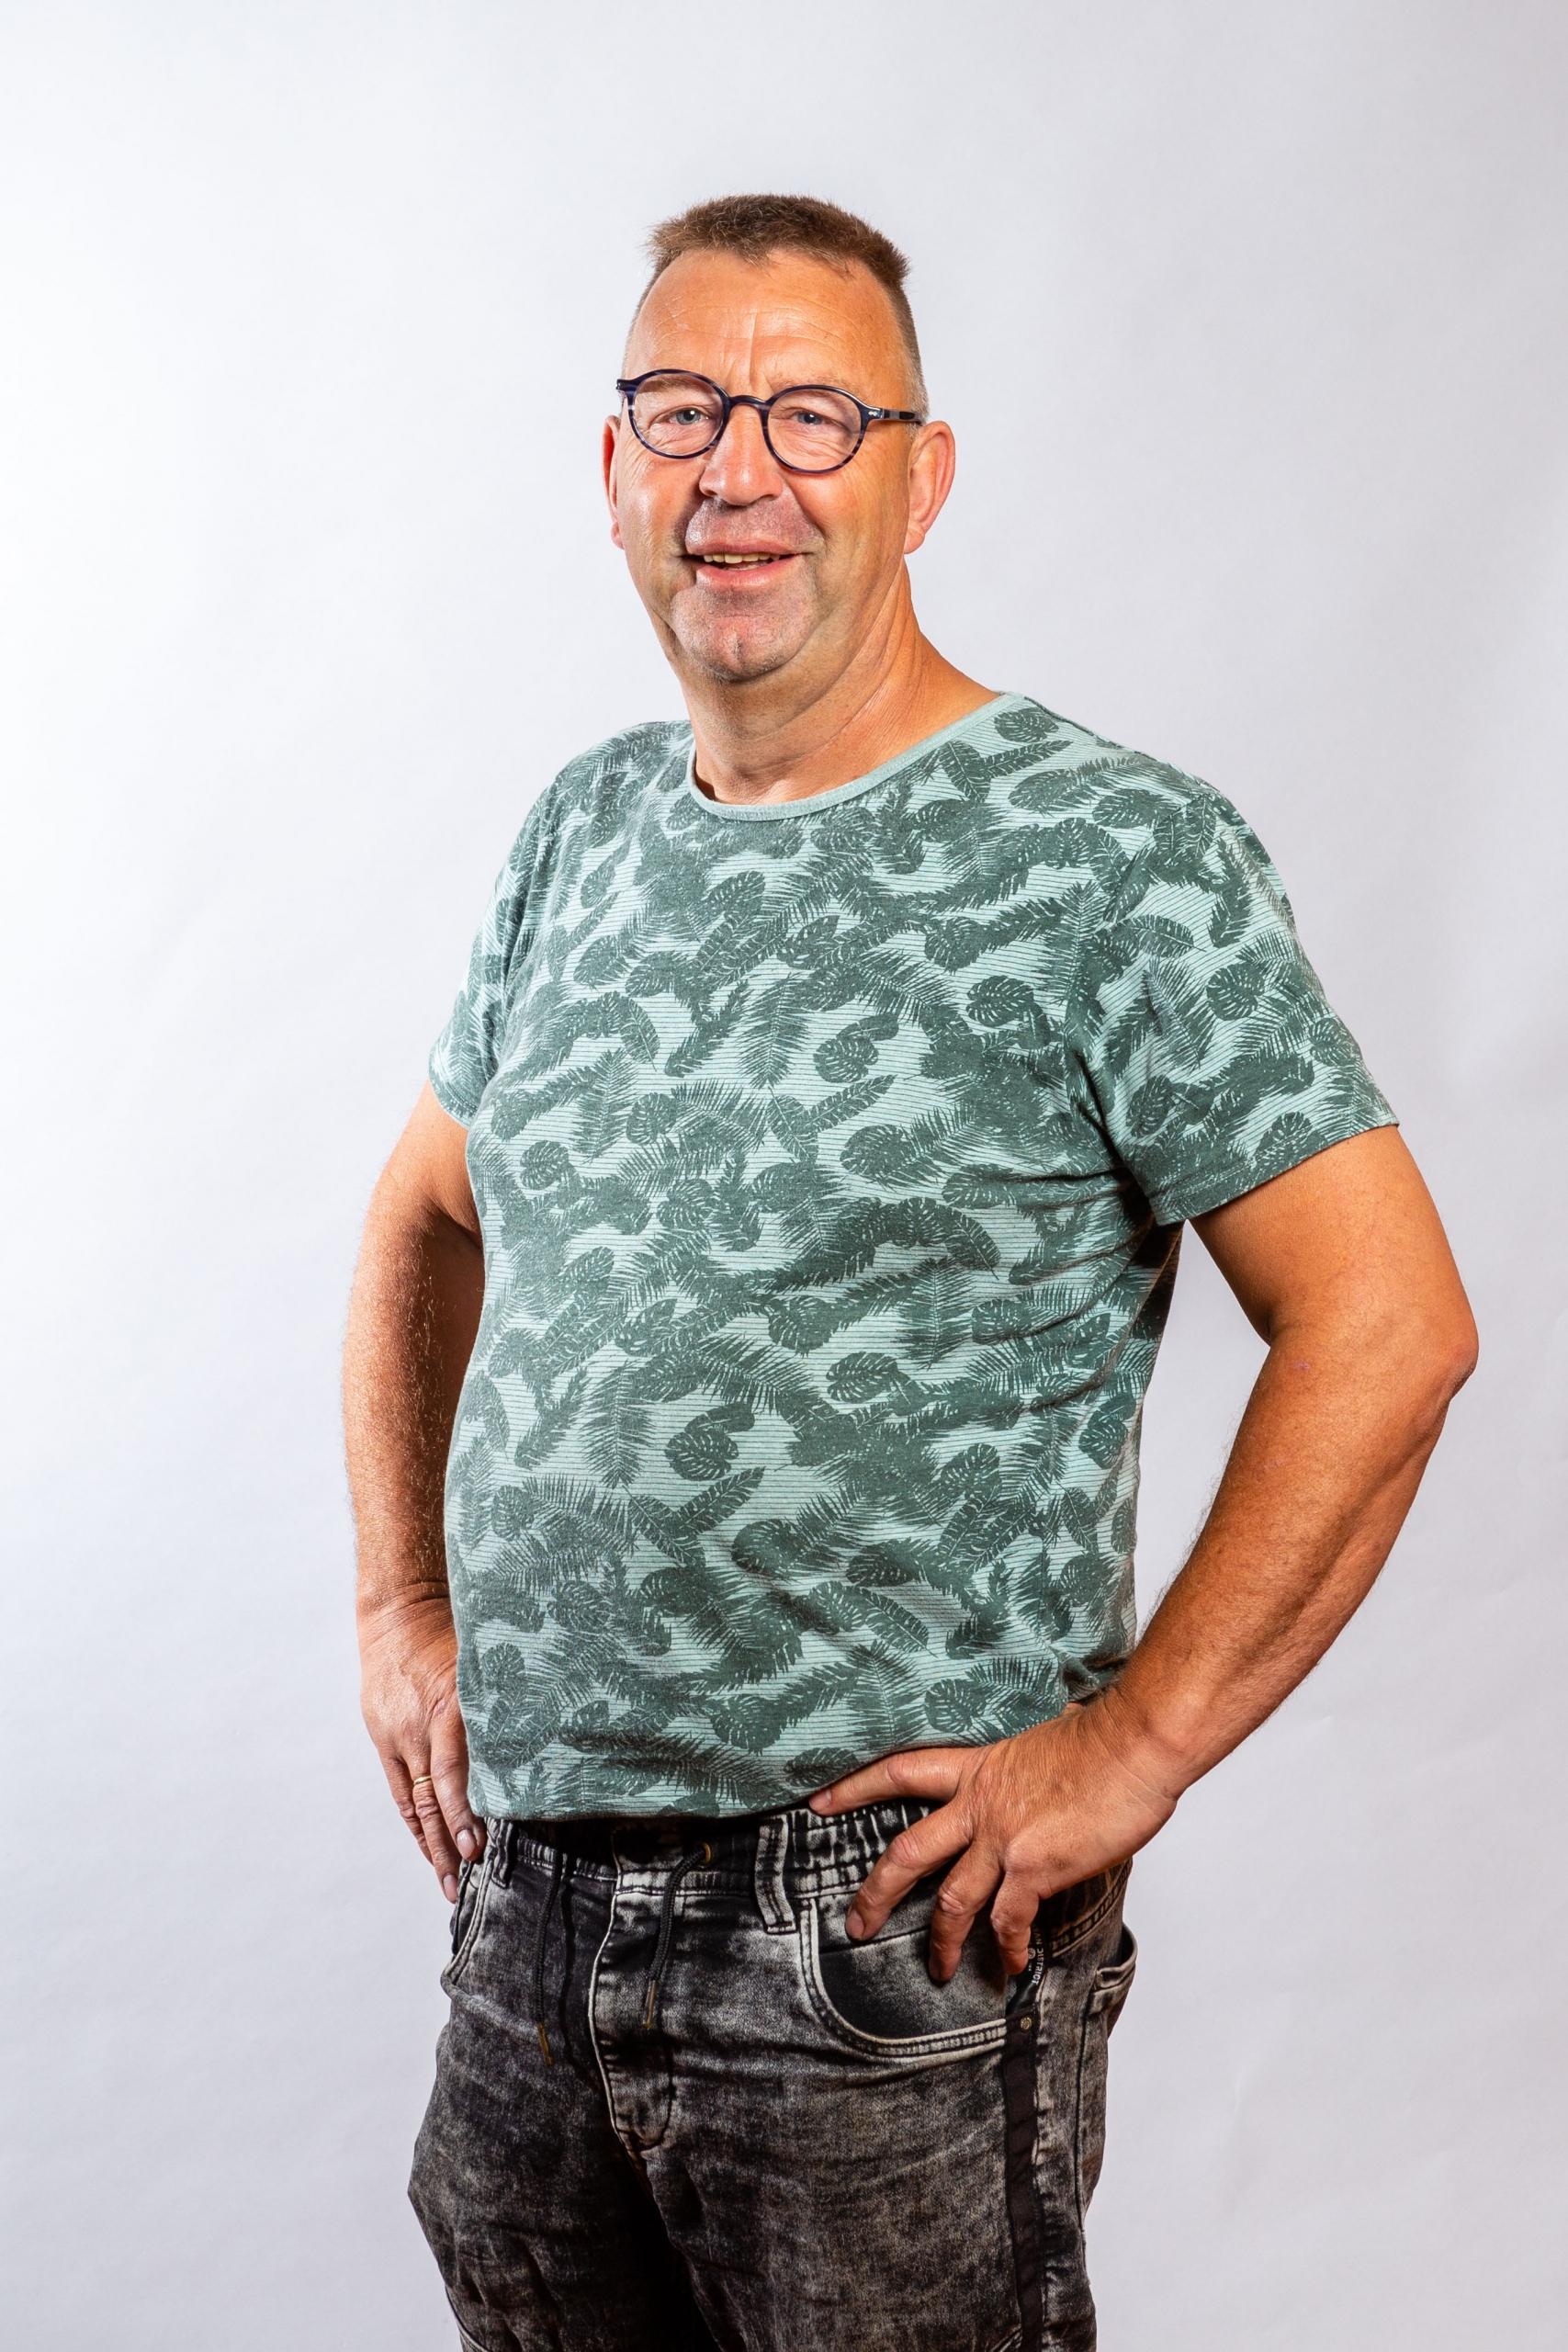 Ron Kuiper